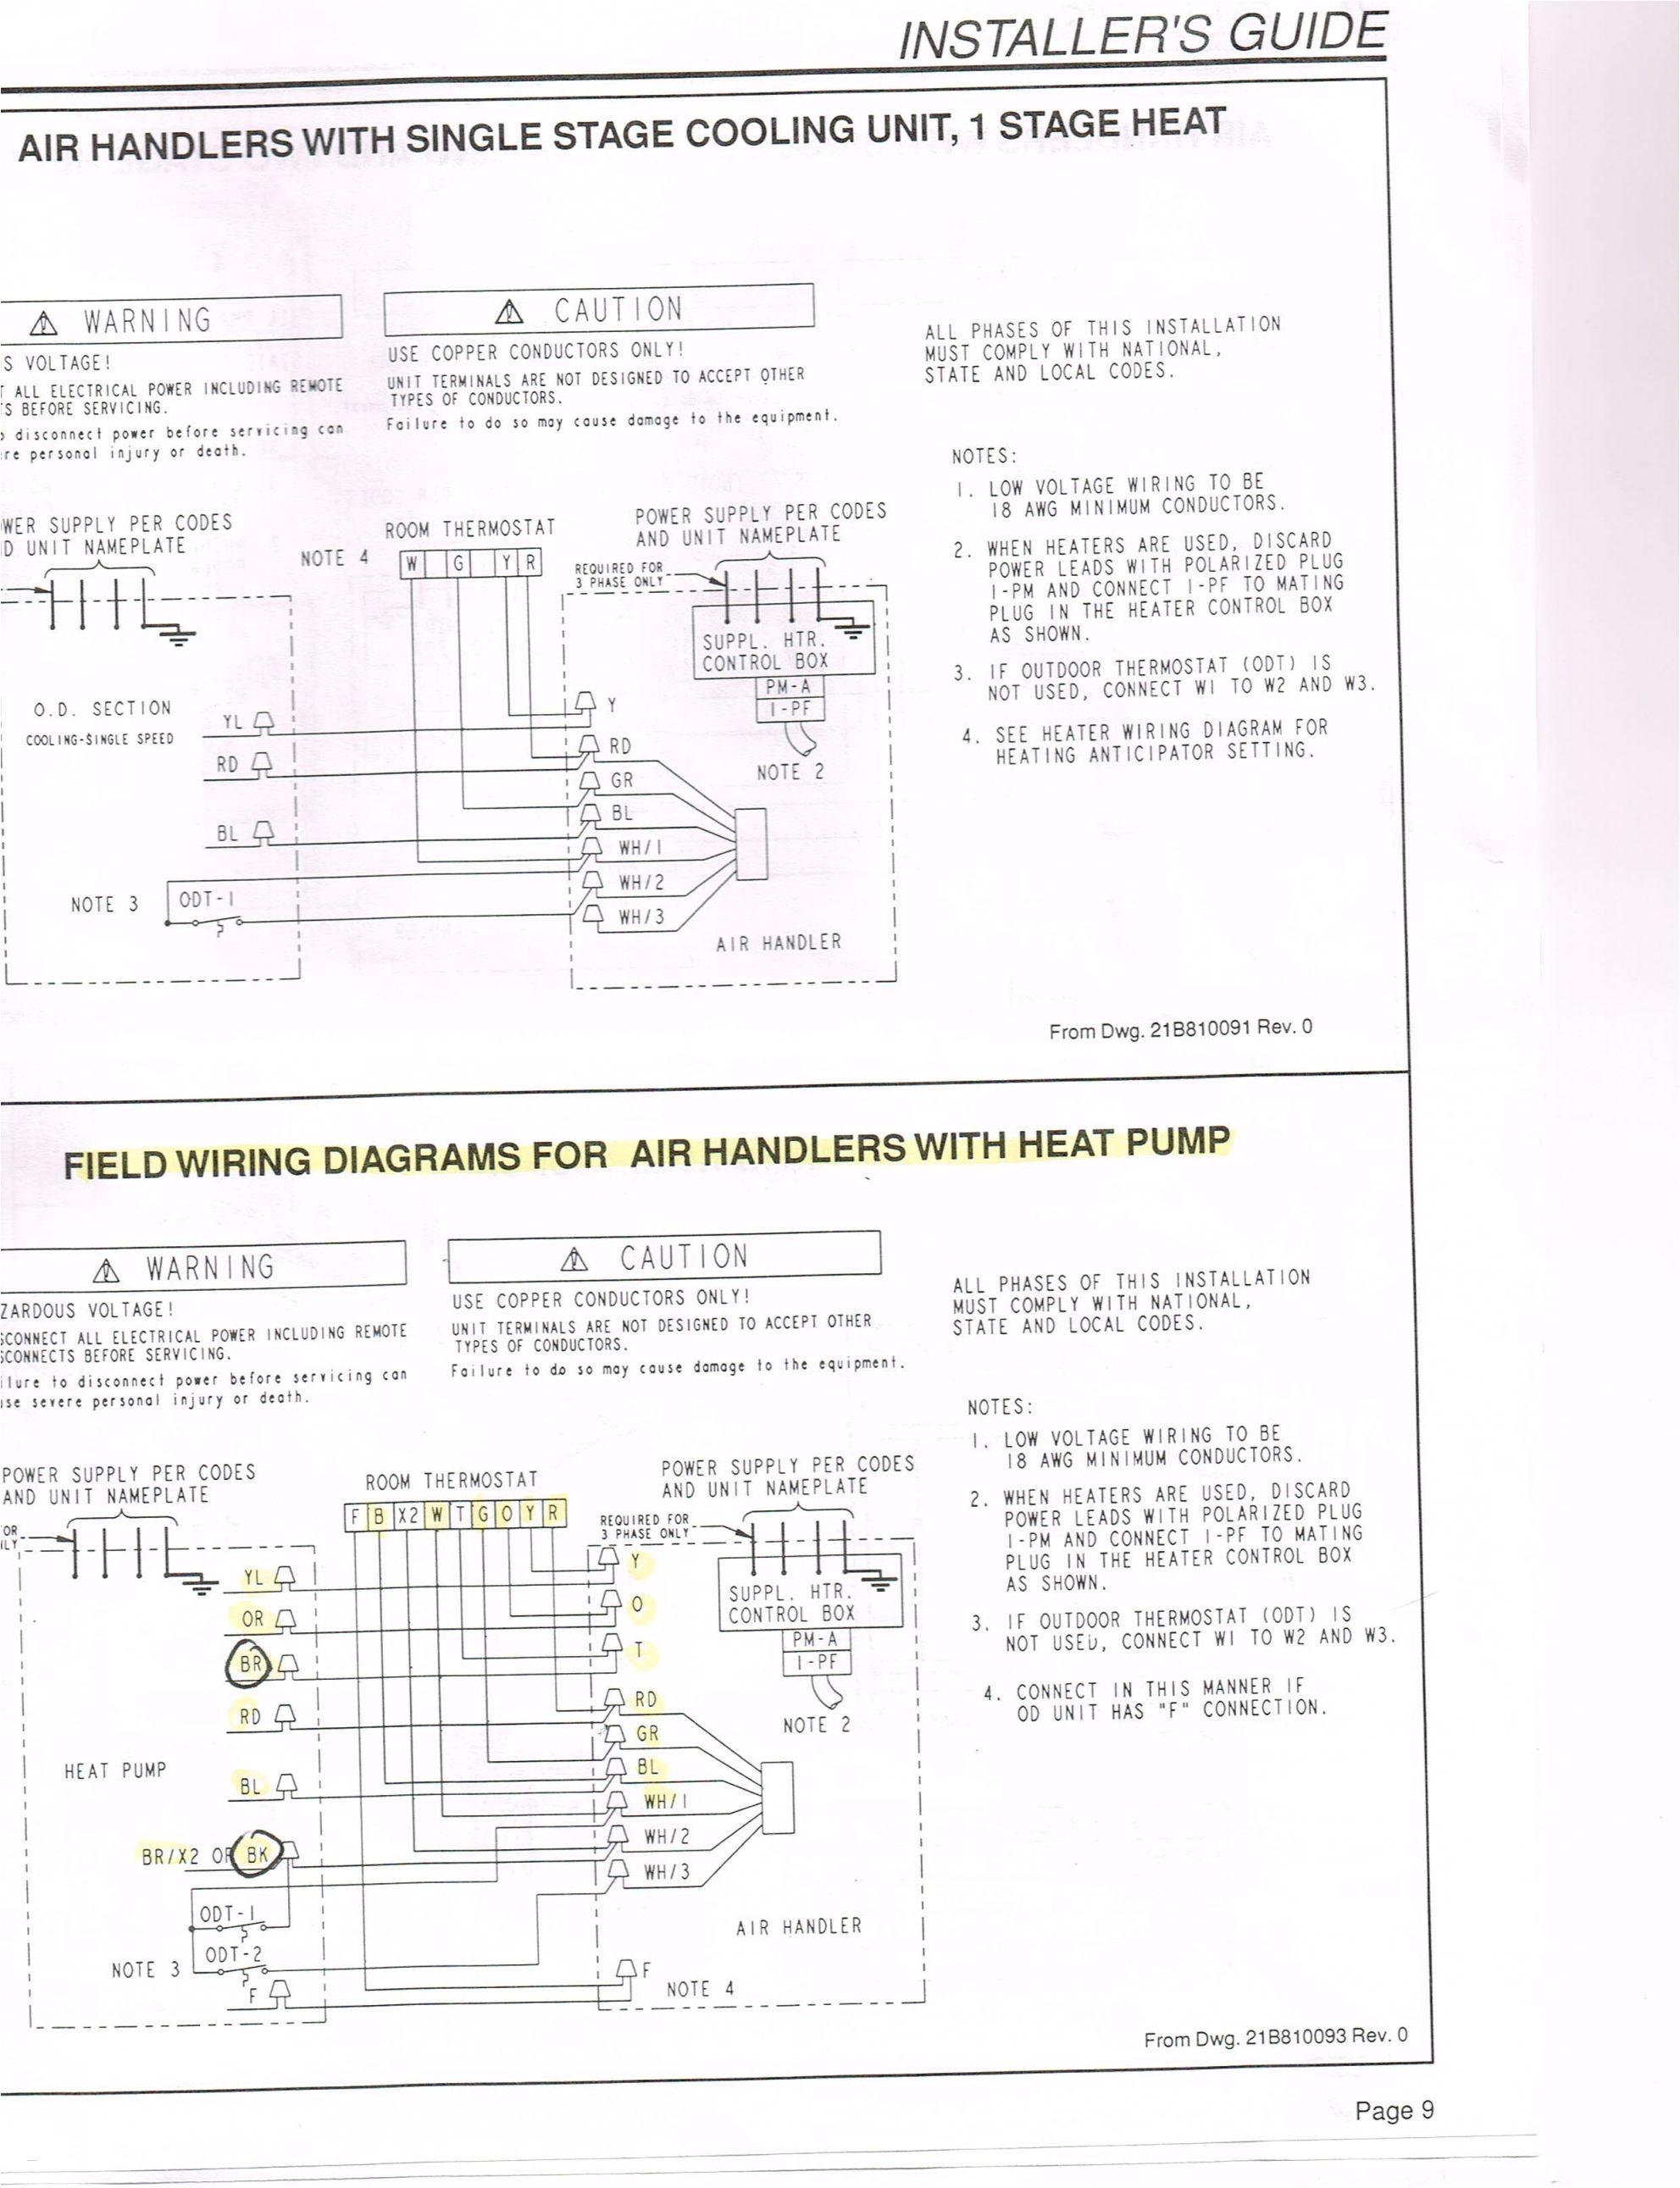 idec relays diagram wiring diagrams place idec relay wiring diagram